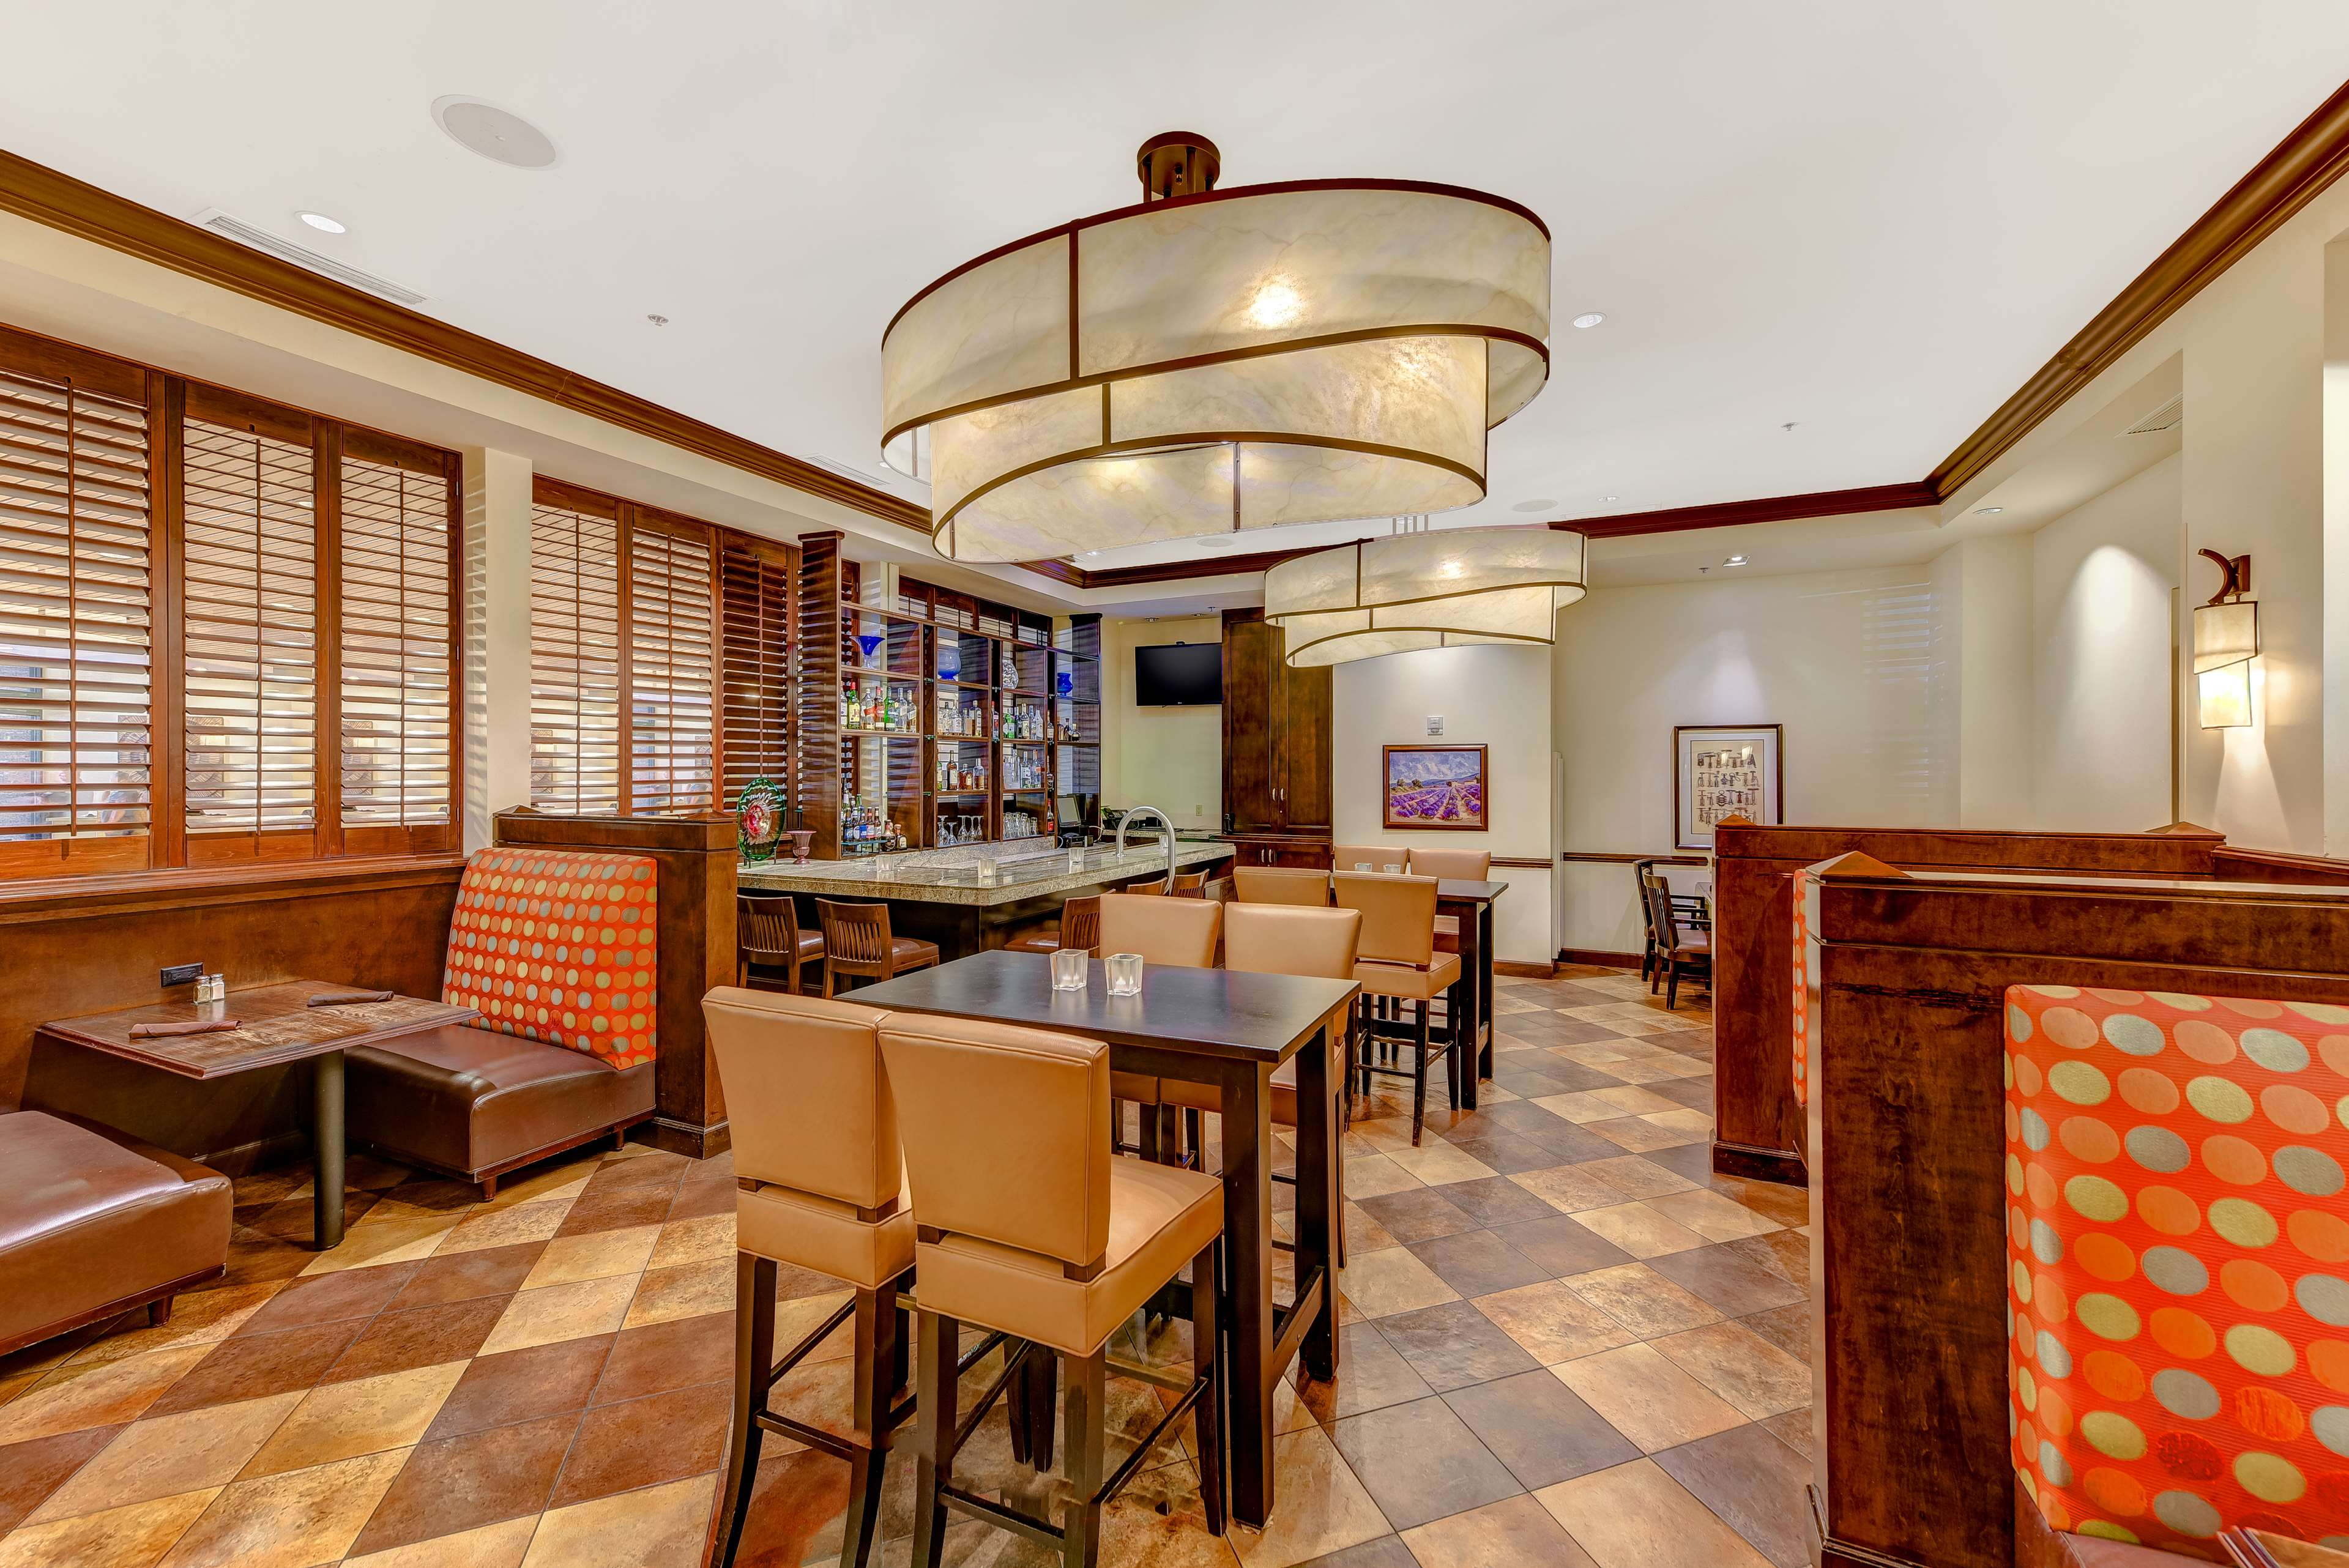 DoubleTree by Hilton Hotel Anaheim - Orange County image 28